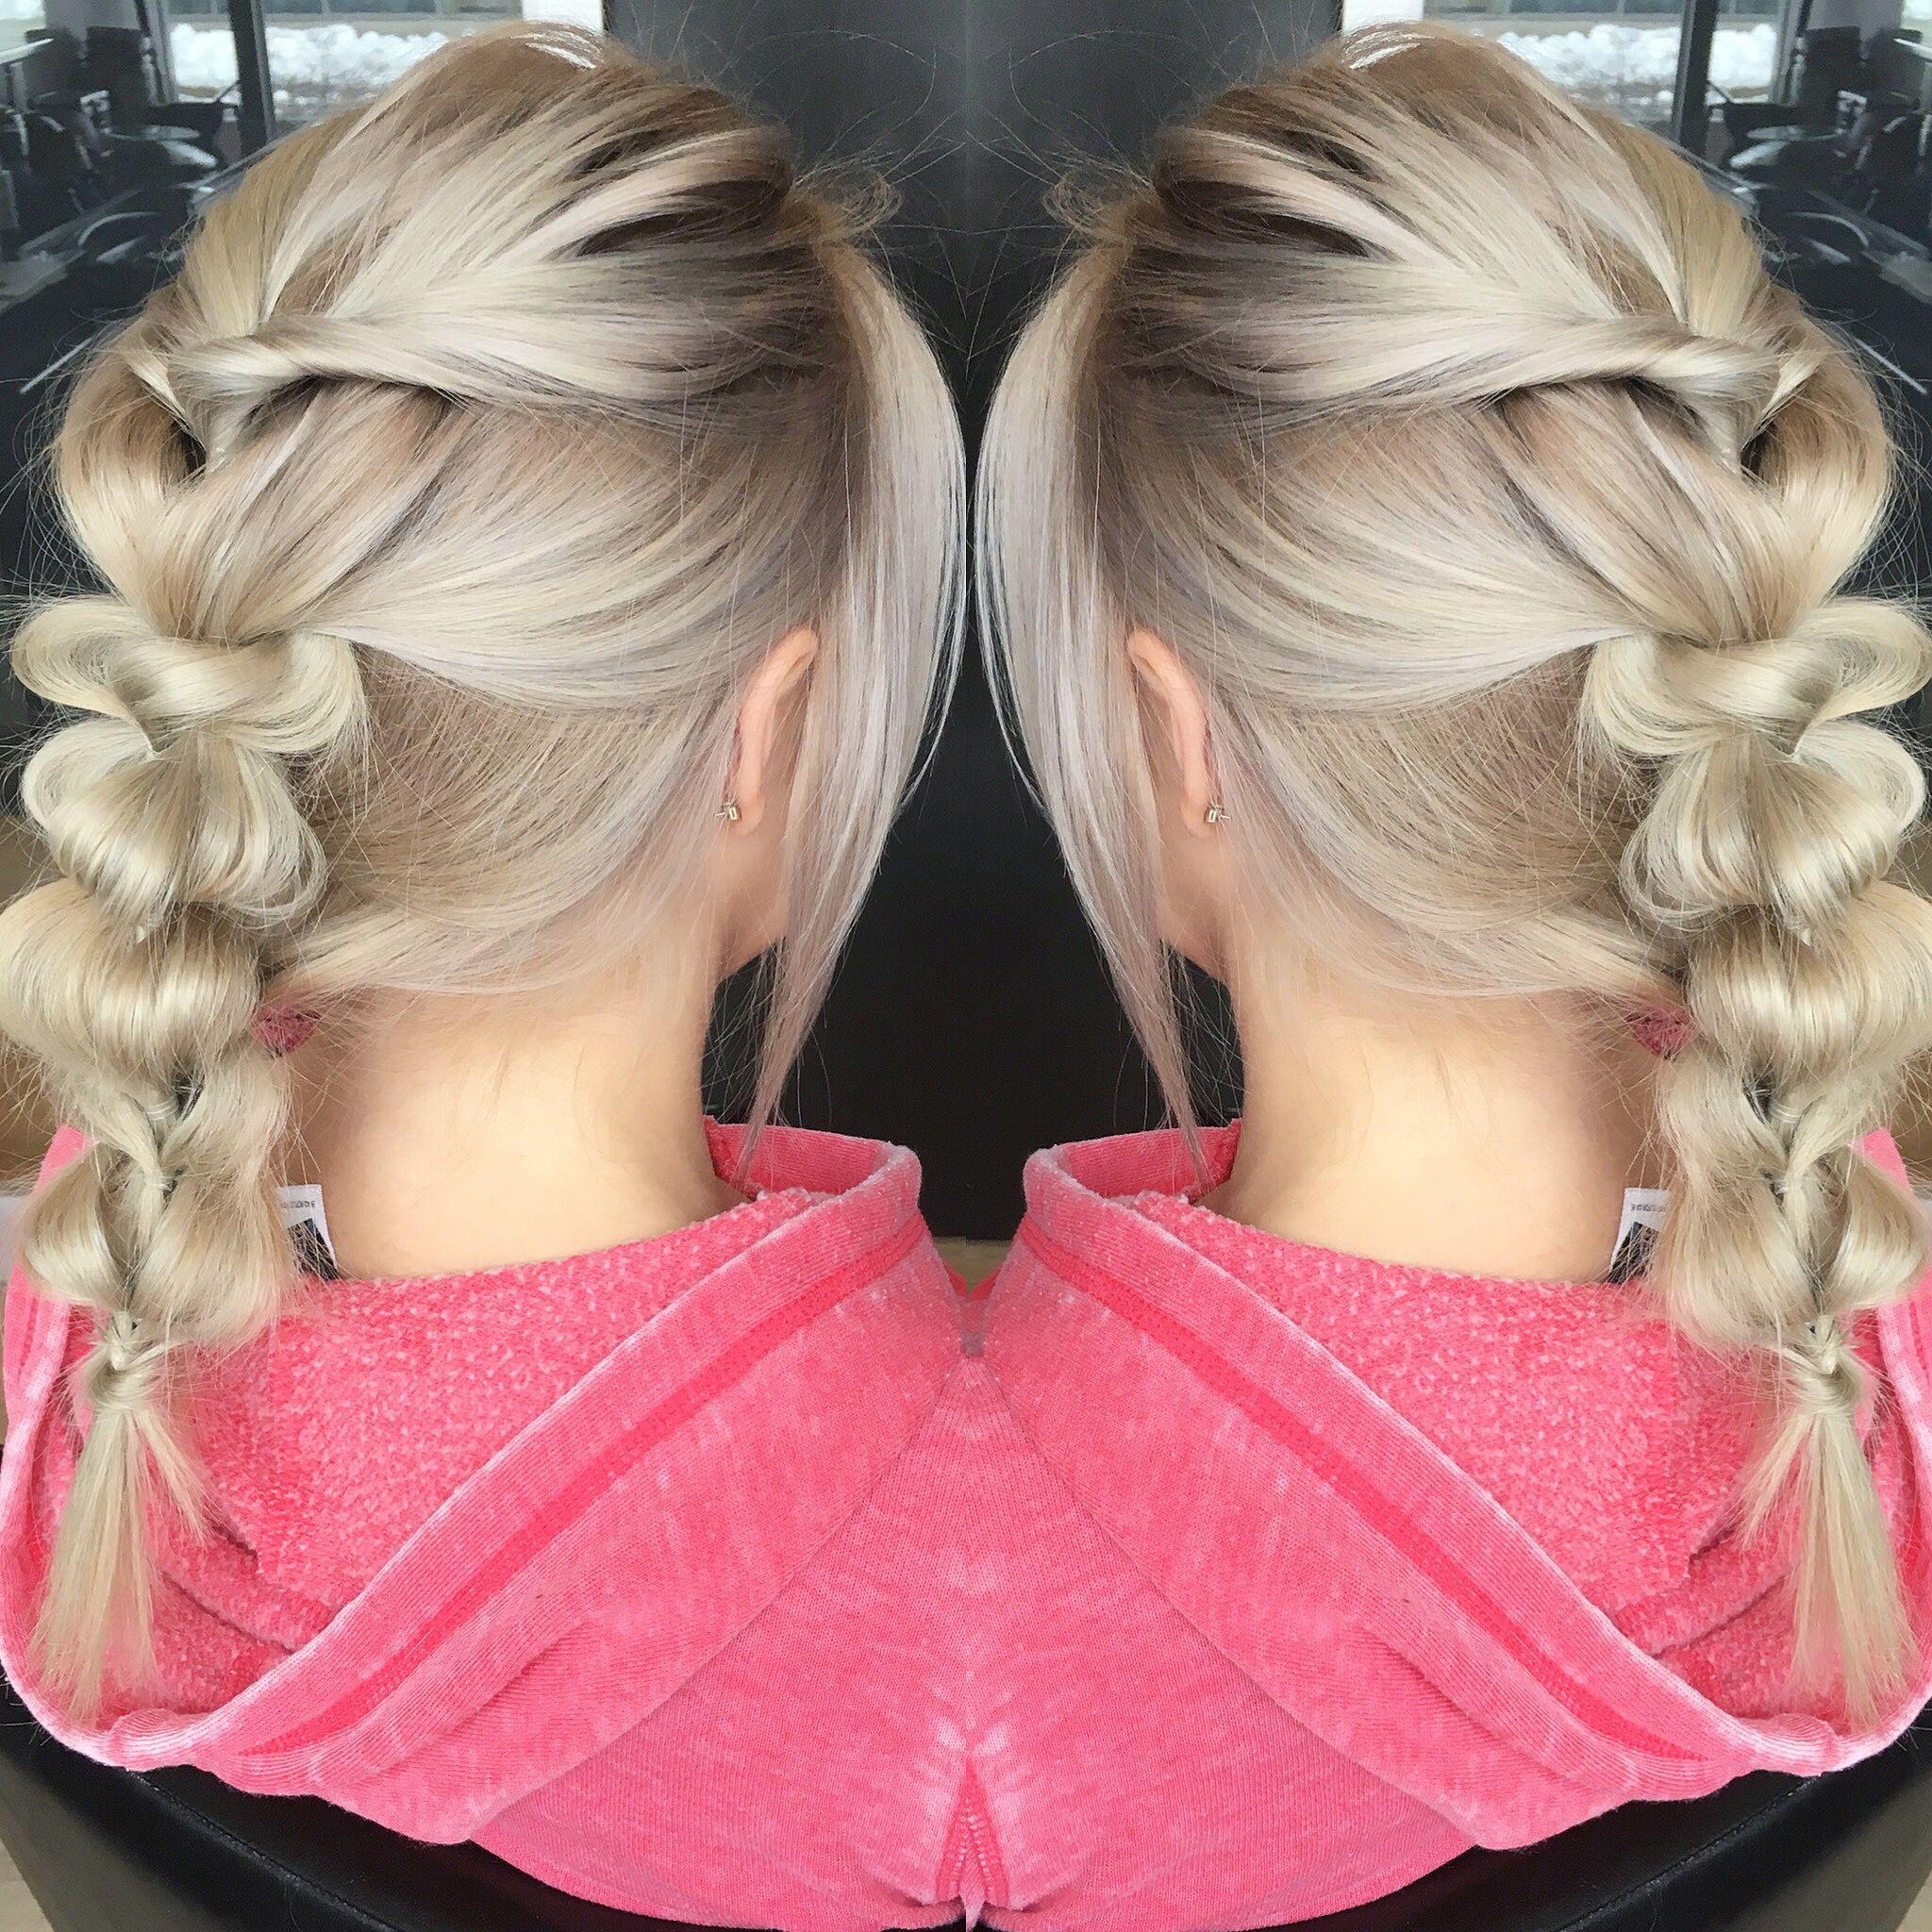 Blonde braided hair hair by jessica price pinterest blonde